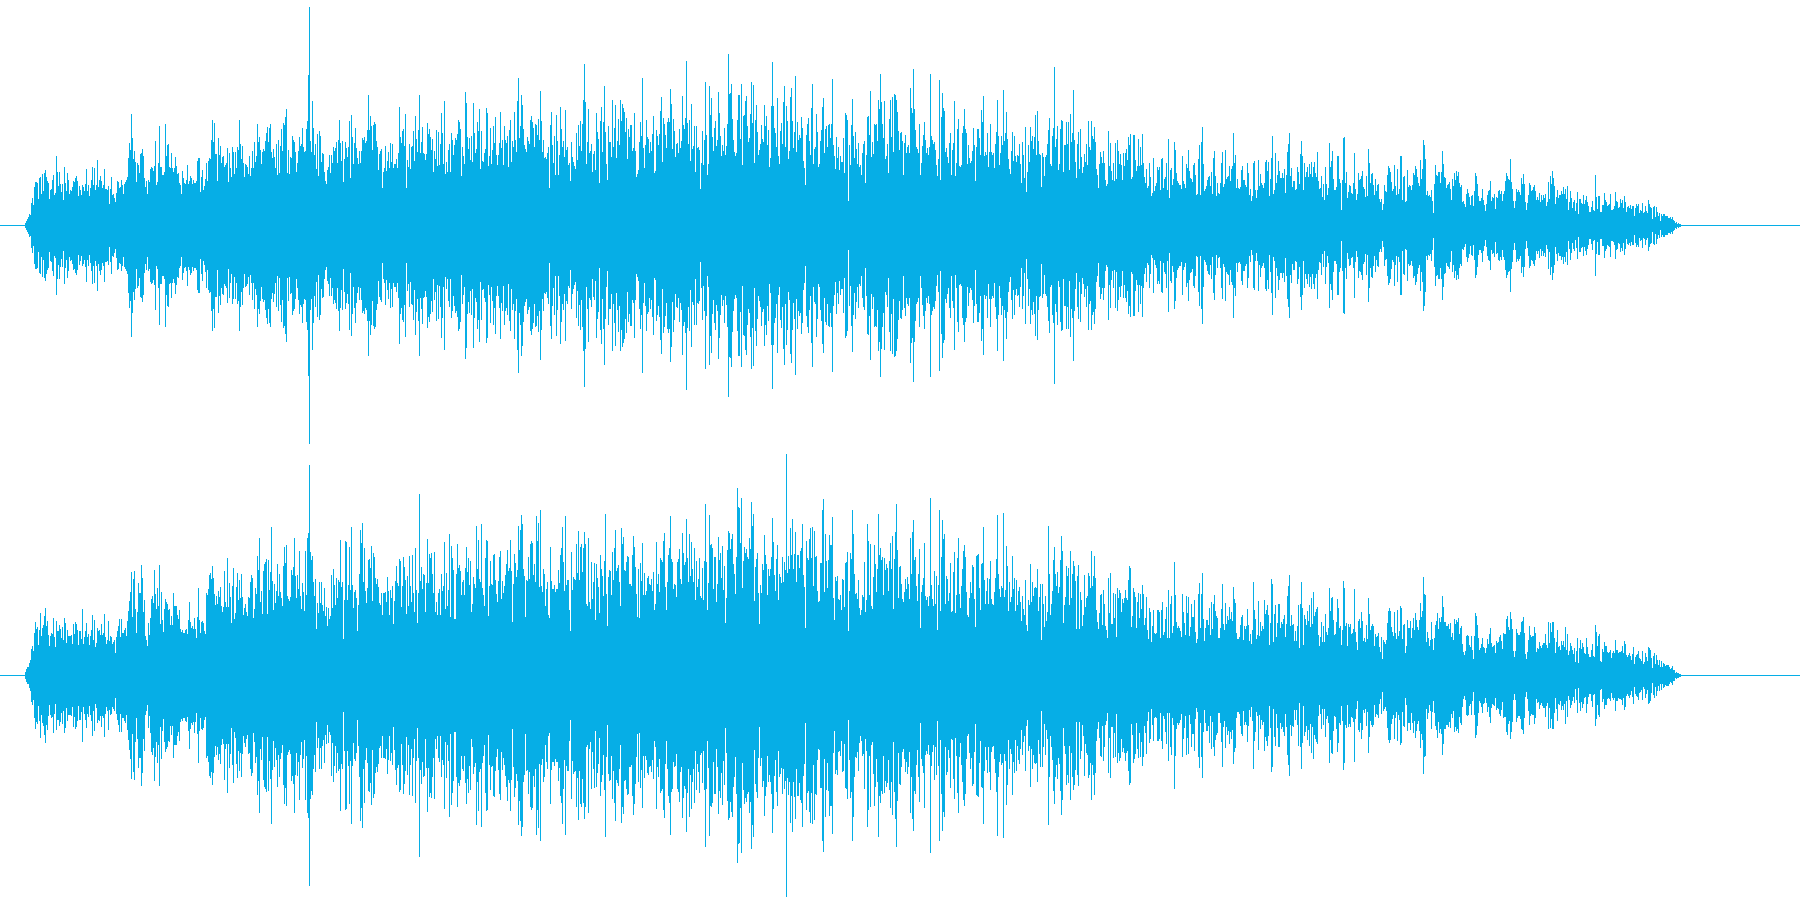 Taylorcraft:着陸インテ...の再生済みの波形